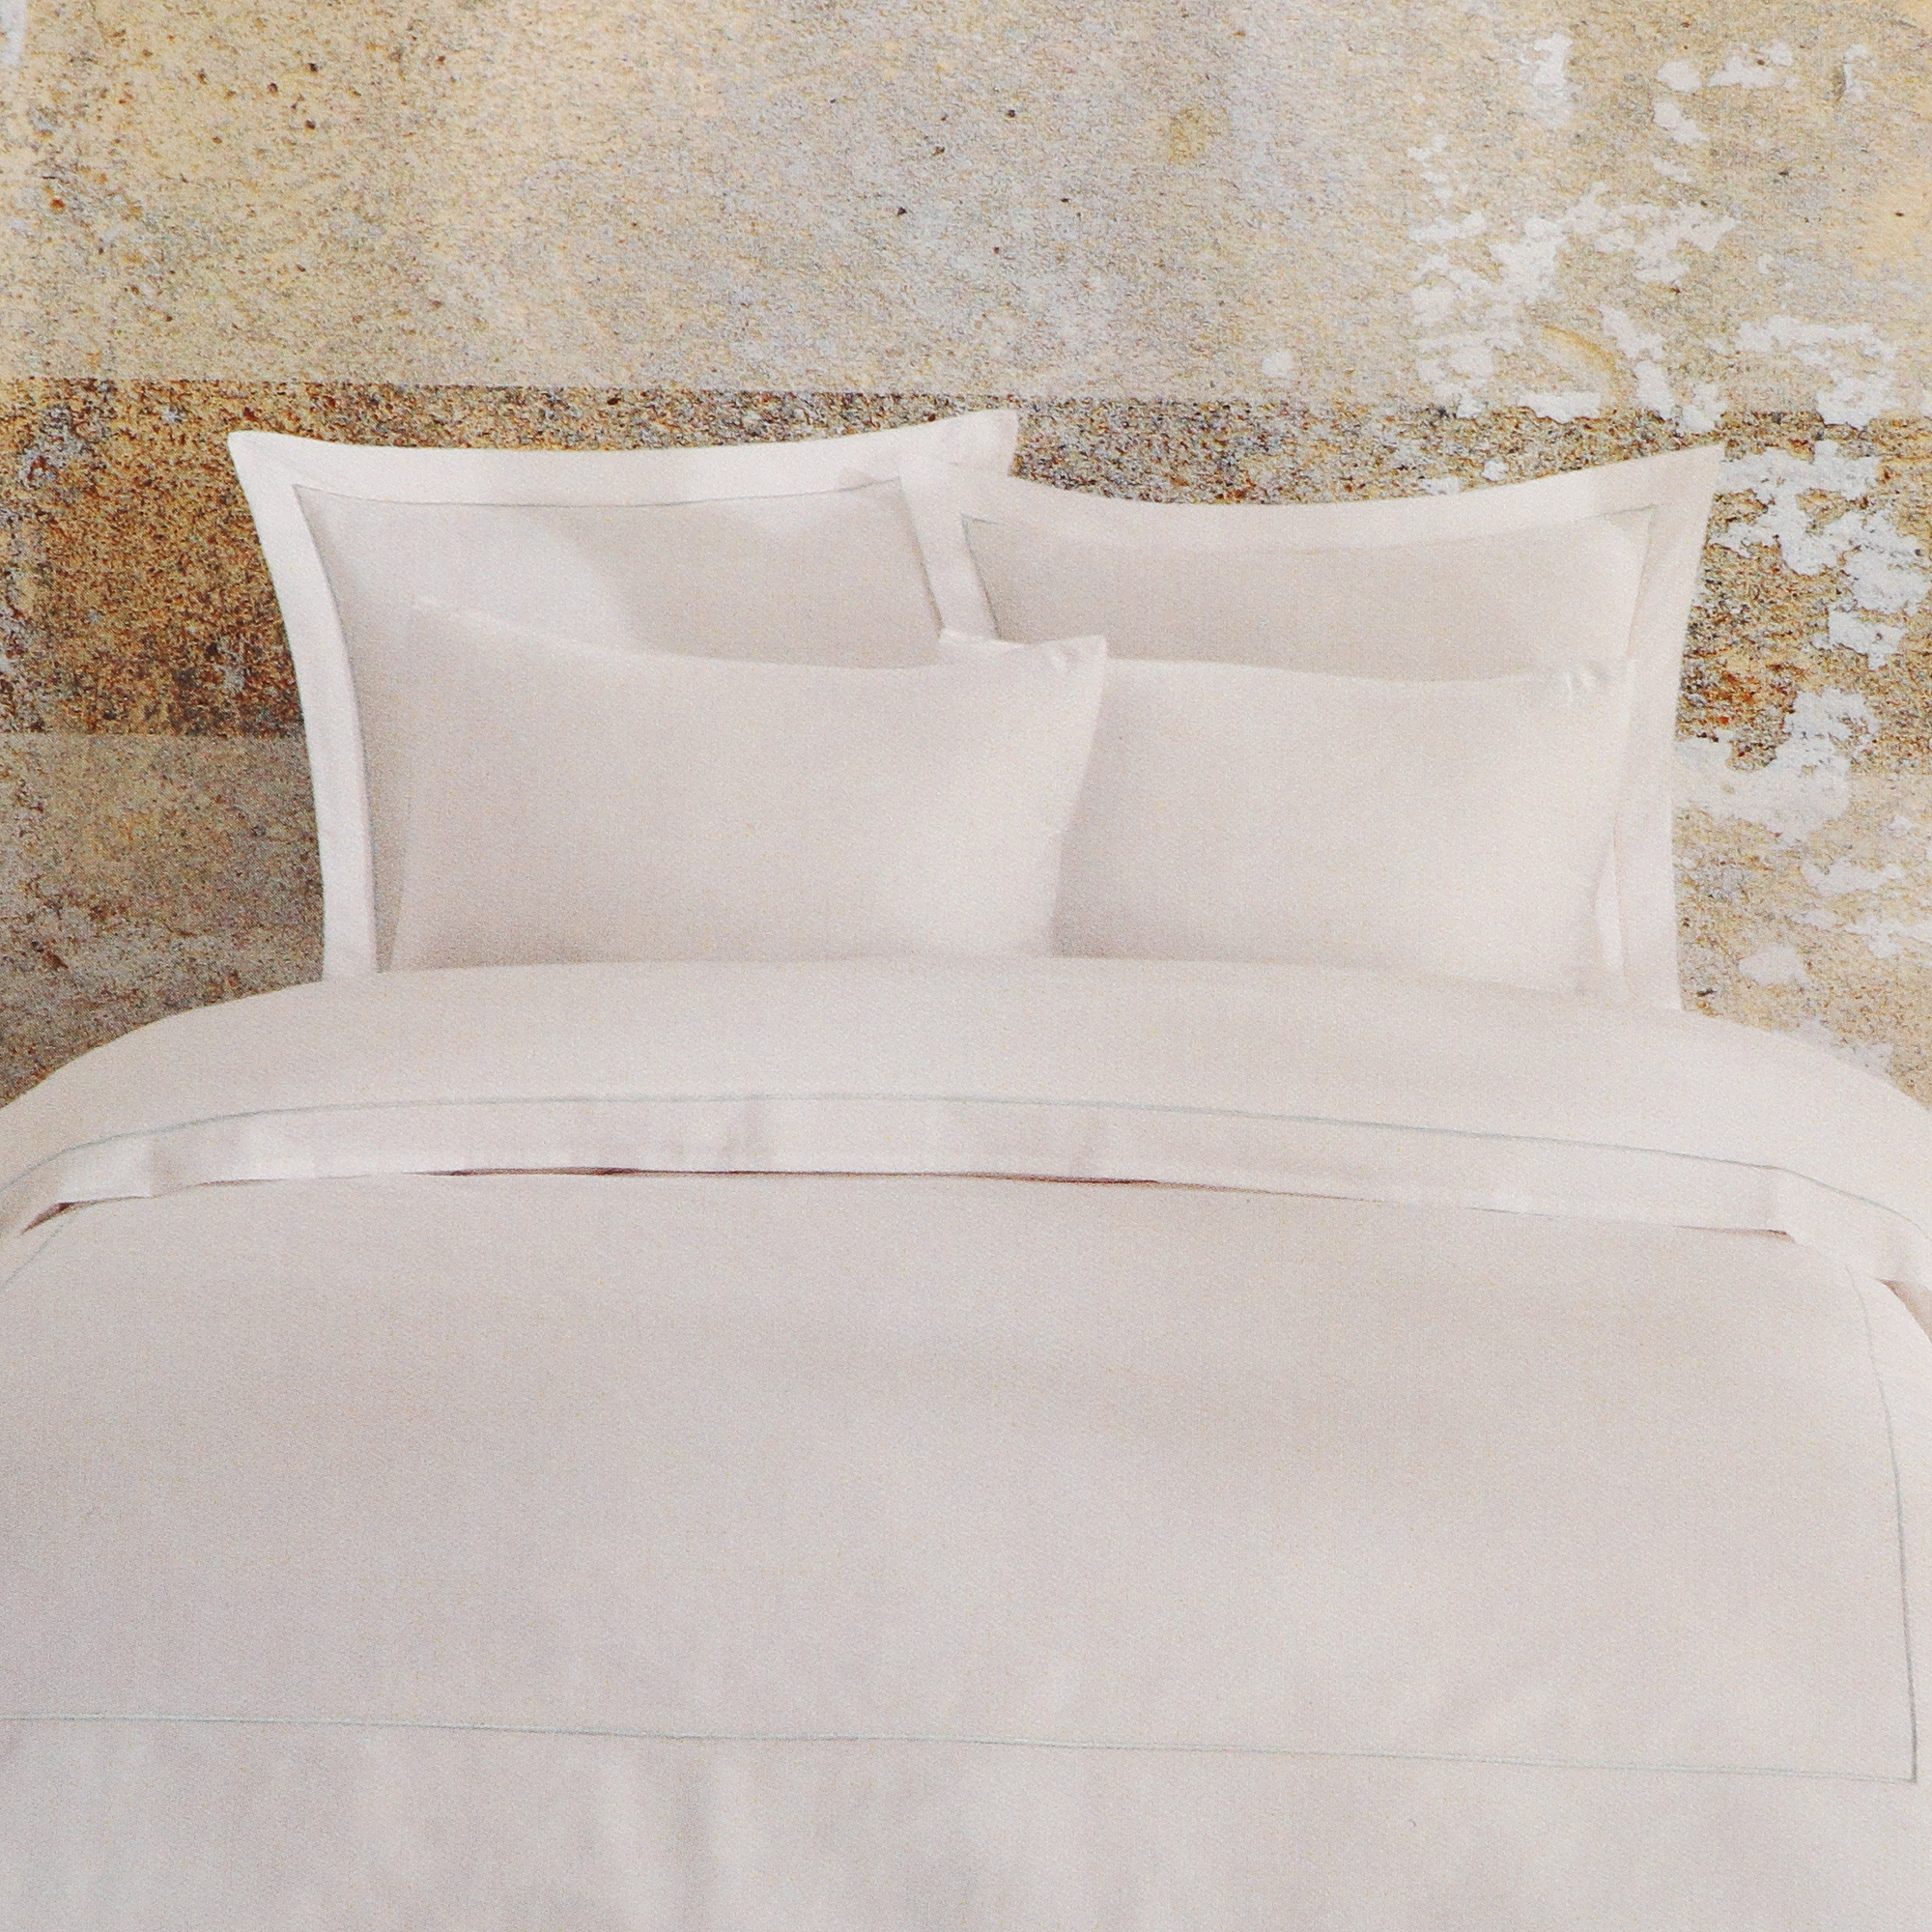 Постельный комплект Bella casa king size white / wan blue stripes постельный комплект bella casa 1 5сп white golden olive stripes